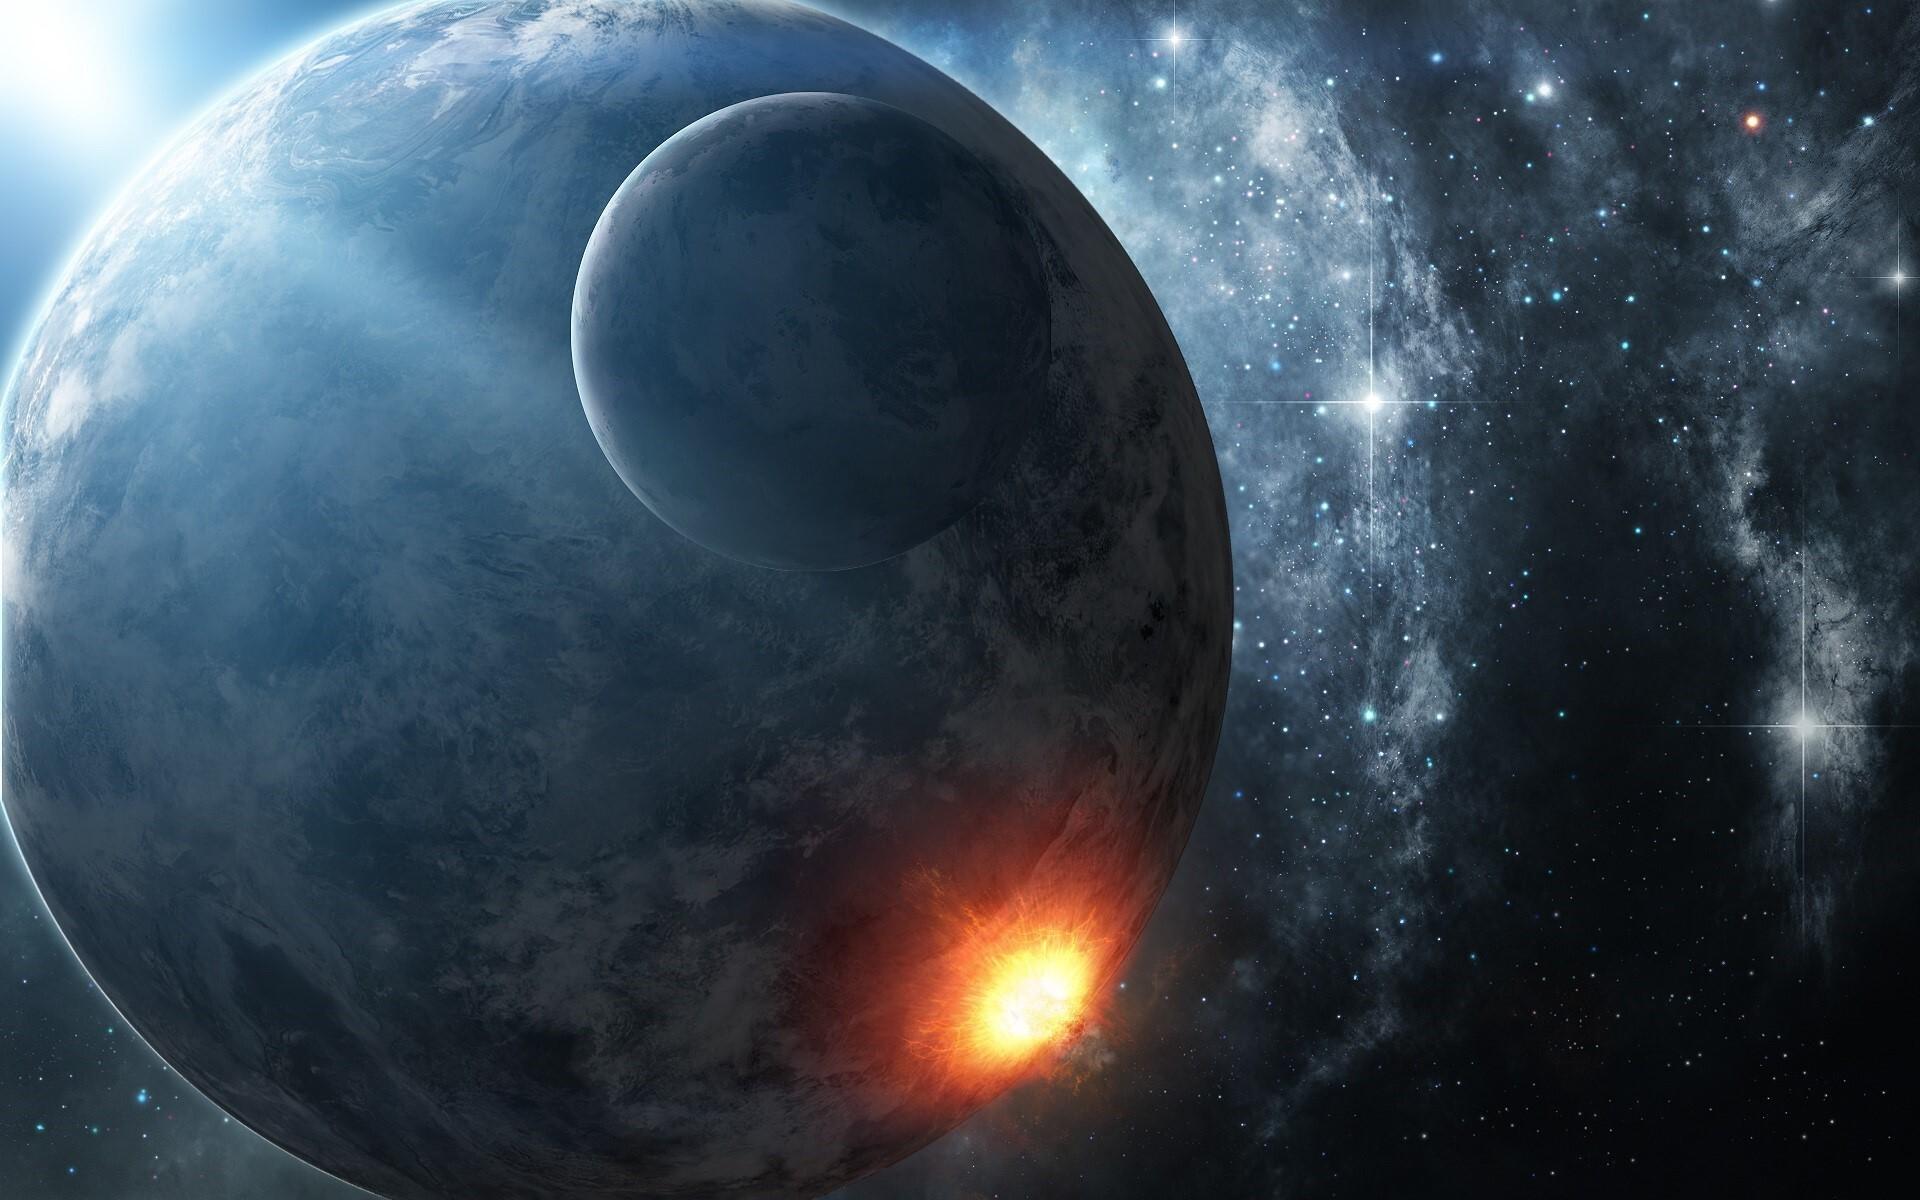 fire planet space wallpaper - photo #8